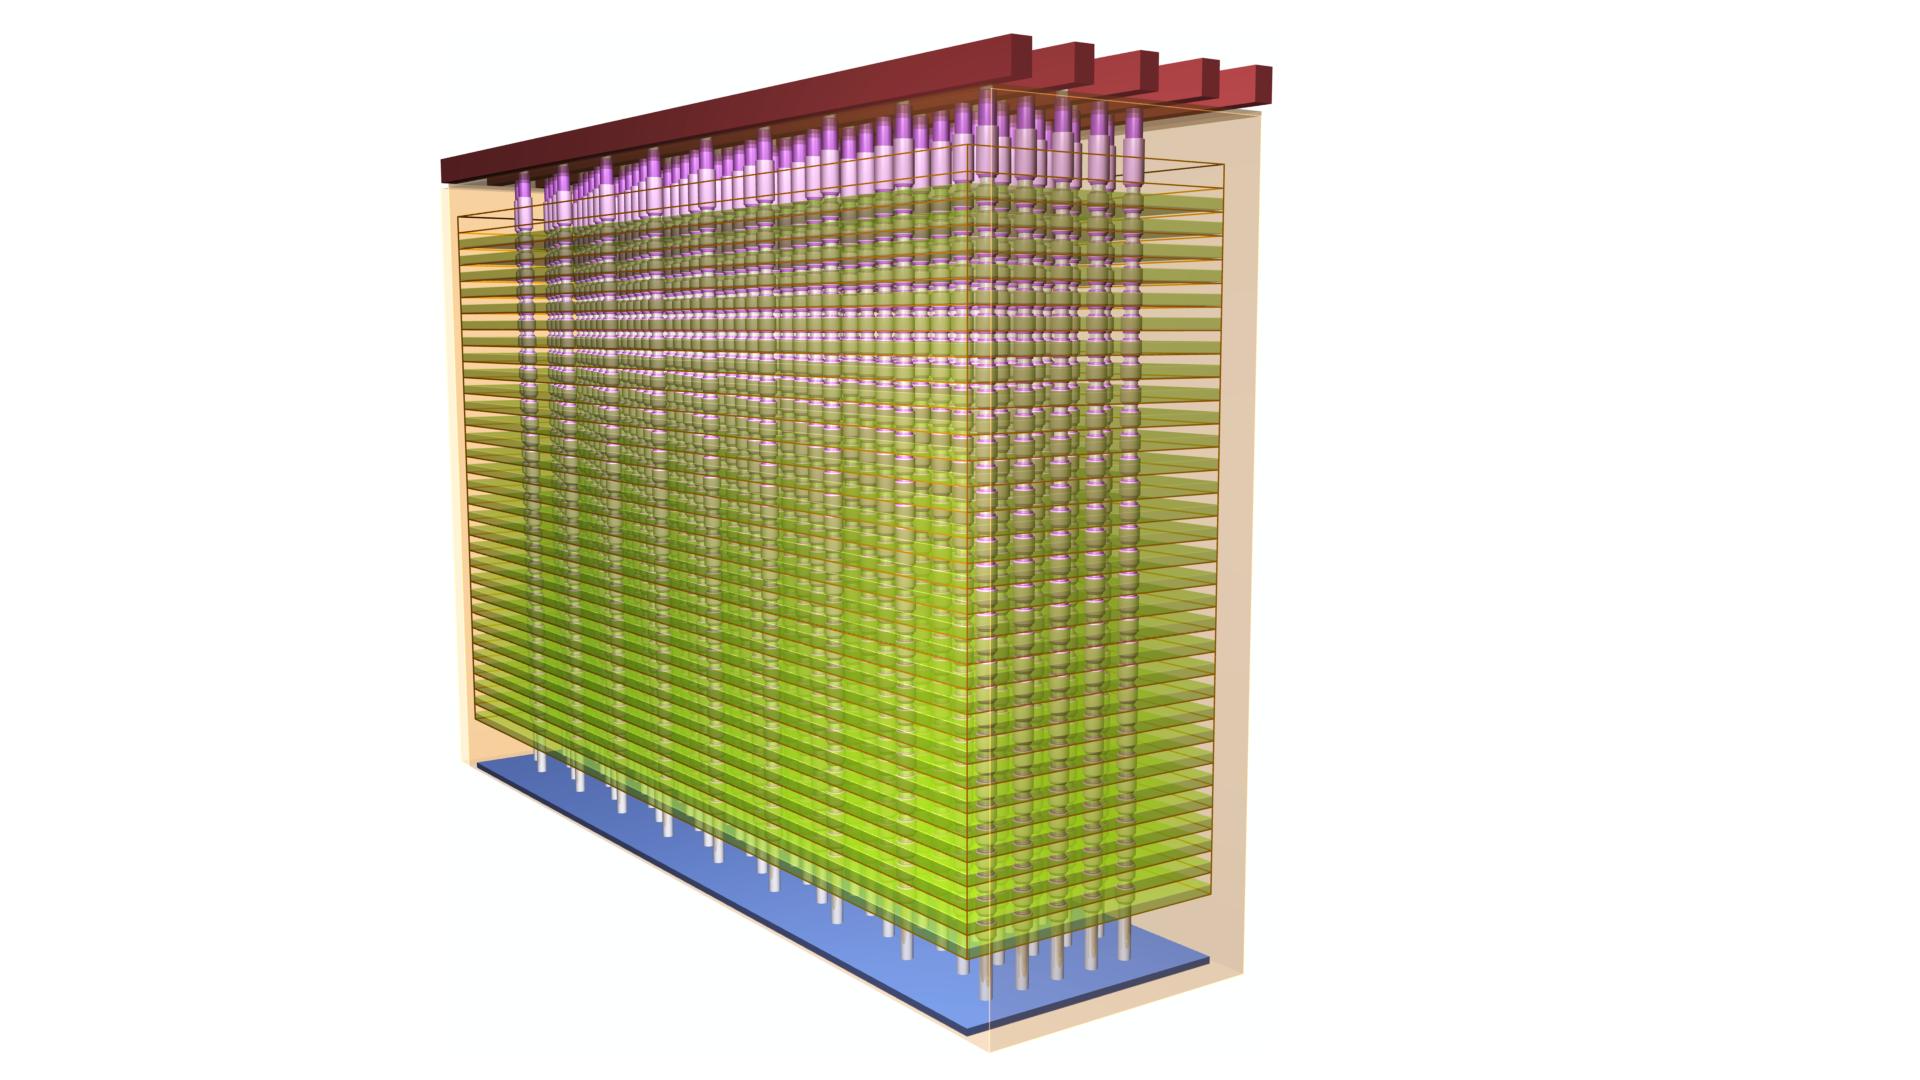 Ổ cứng SSD Intel 760P 256GB 3D-NAND M.2 NVMe PCIe